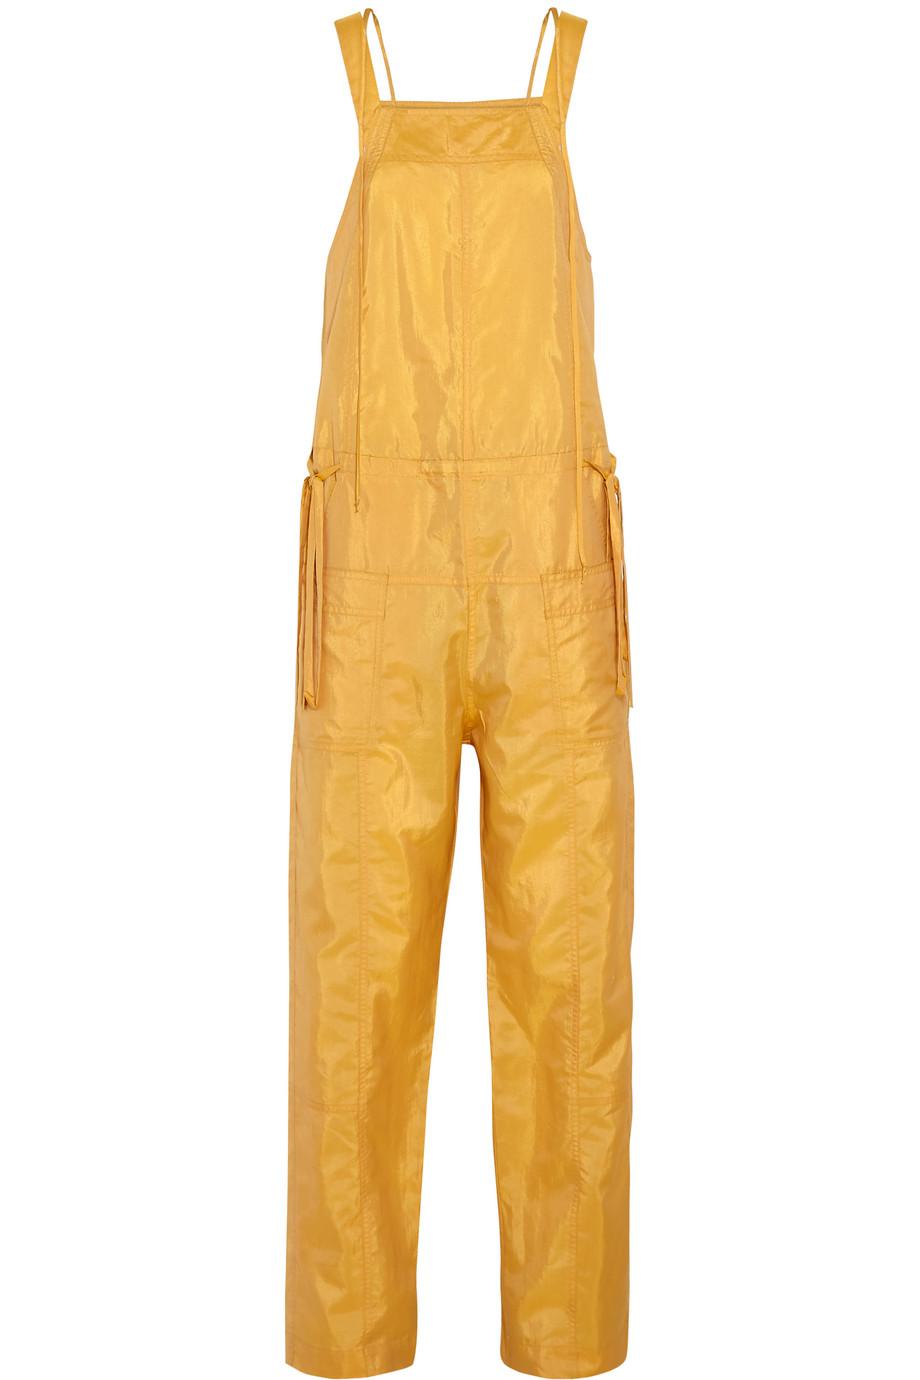 Isabel Marant Kyles Taffeta Jumpsuit, Yellow, Women's, Size: 34